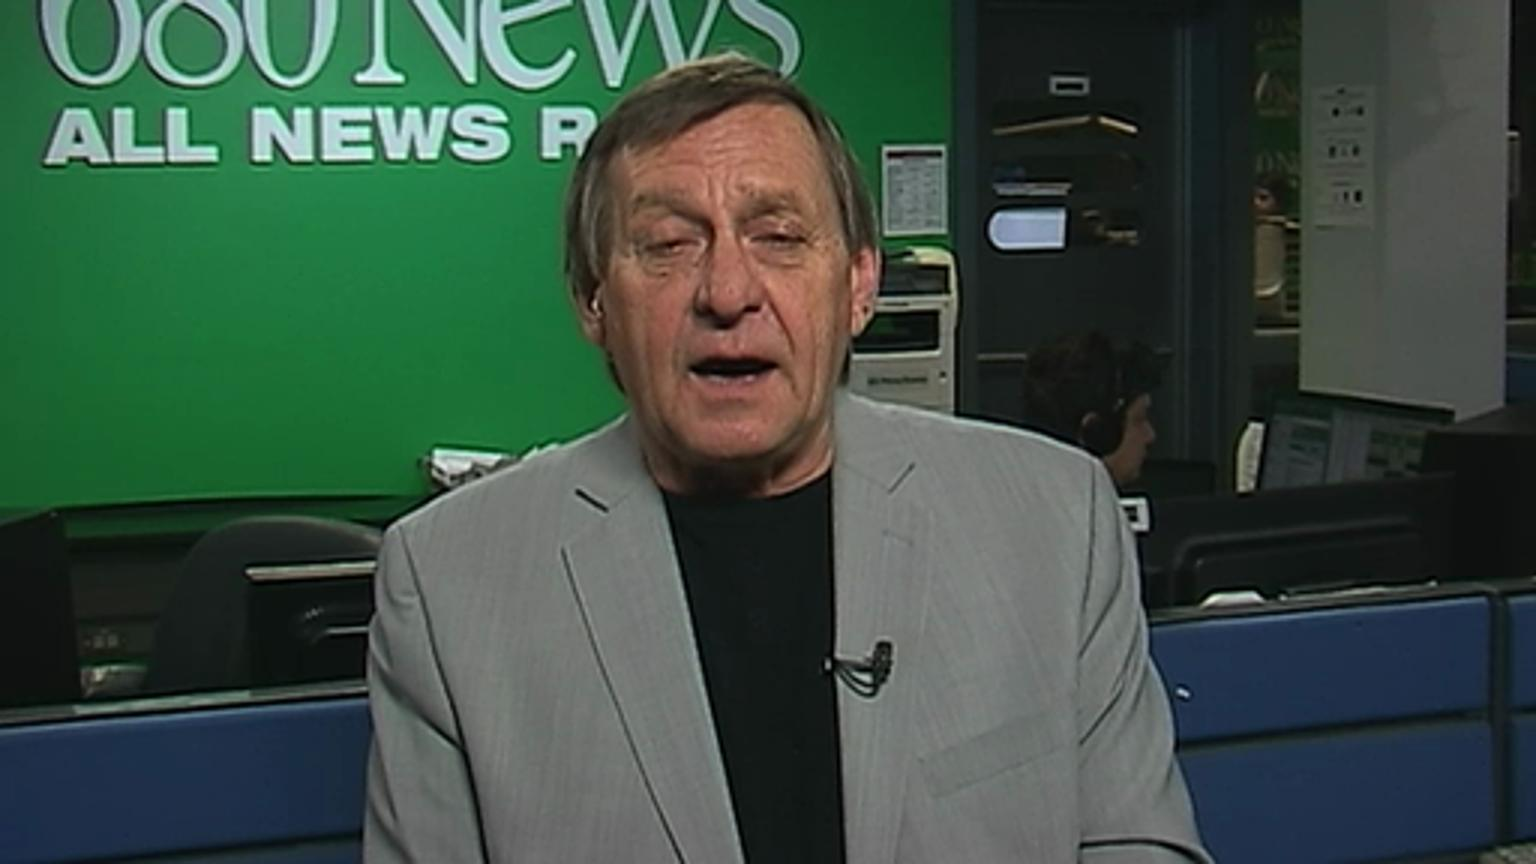 OPP & Ford investigation is 'bizarre:' John Stall